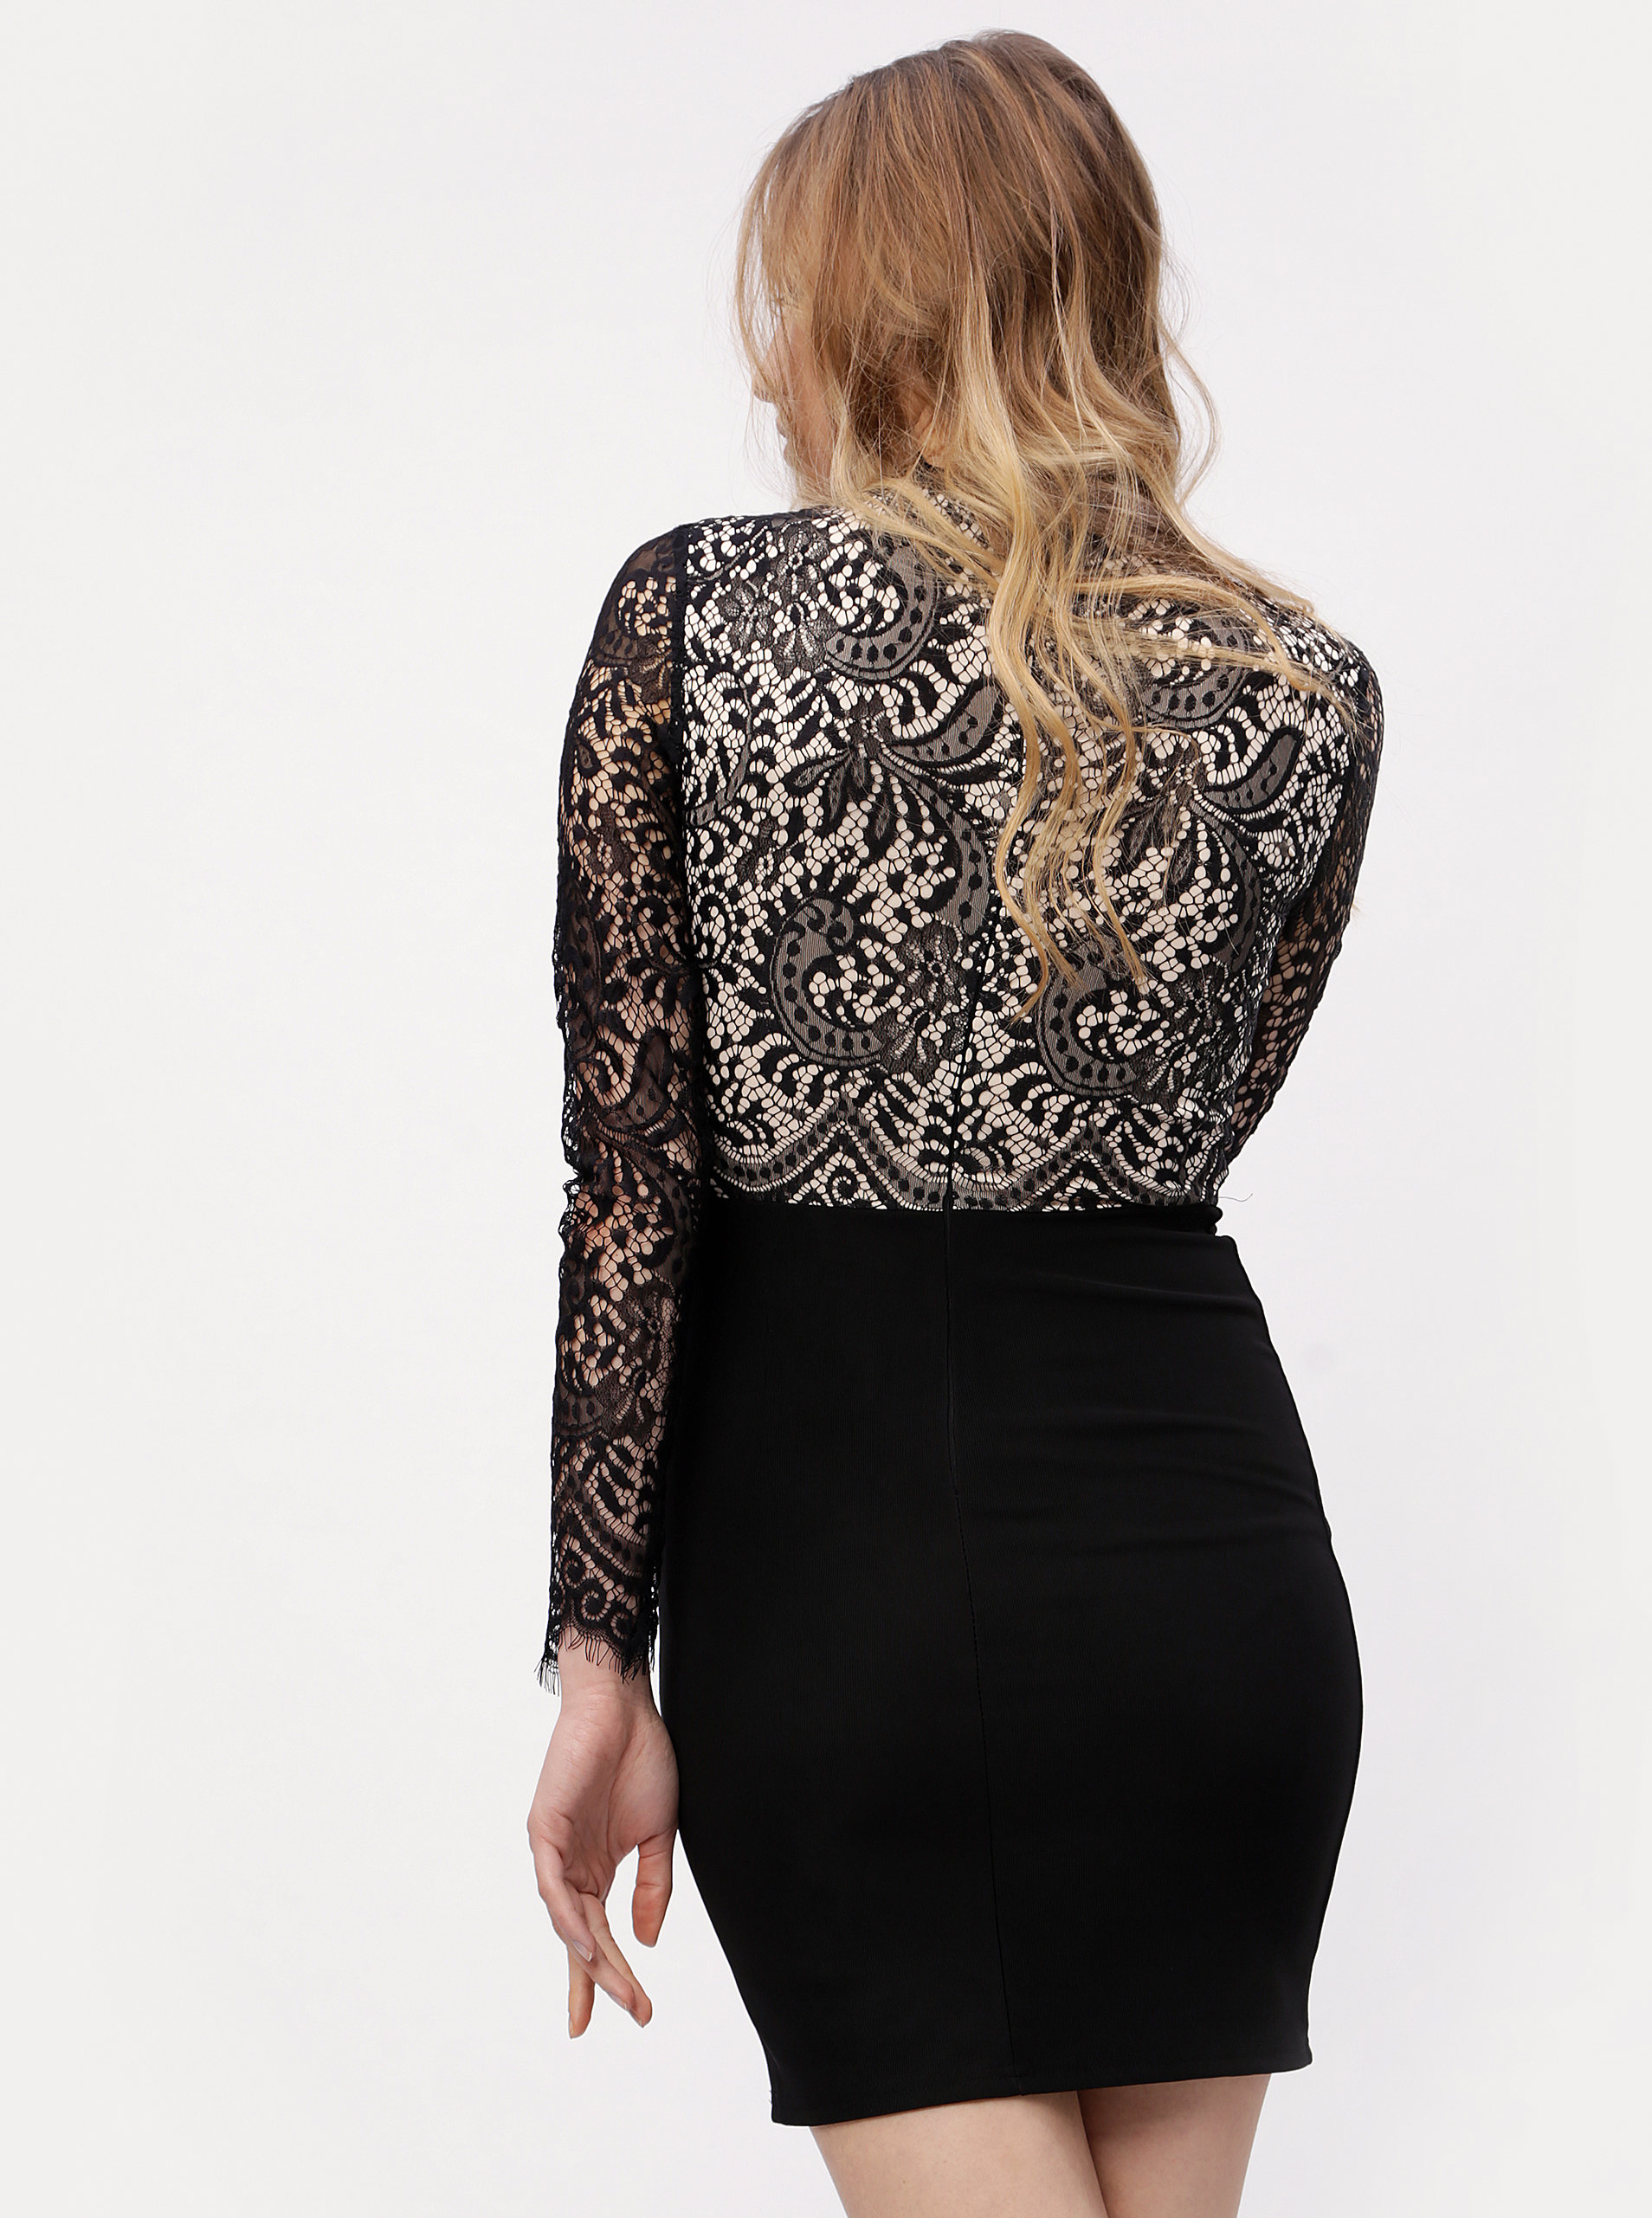 Béžovo-černé krajkové šaty s dlouhým rukávem MISSGUIDED ... a1f158a242